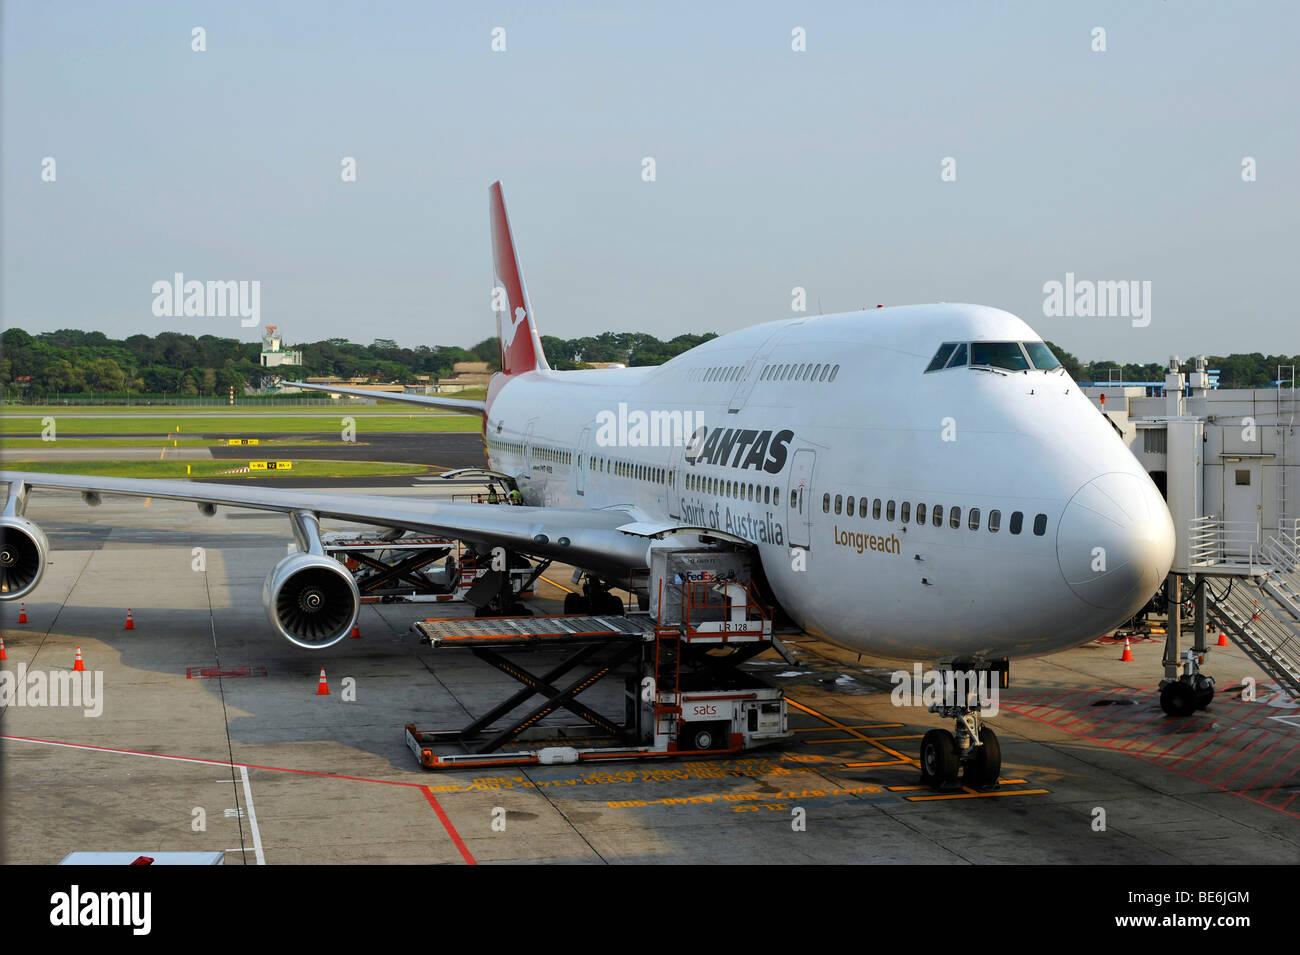 Pre-flight preparations of a Qantas Boeing 747-400, Singapore Changi International Airport, Singapore, Asia - Stock Image